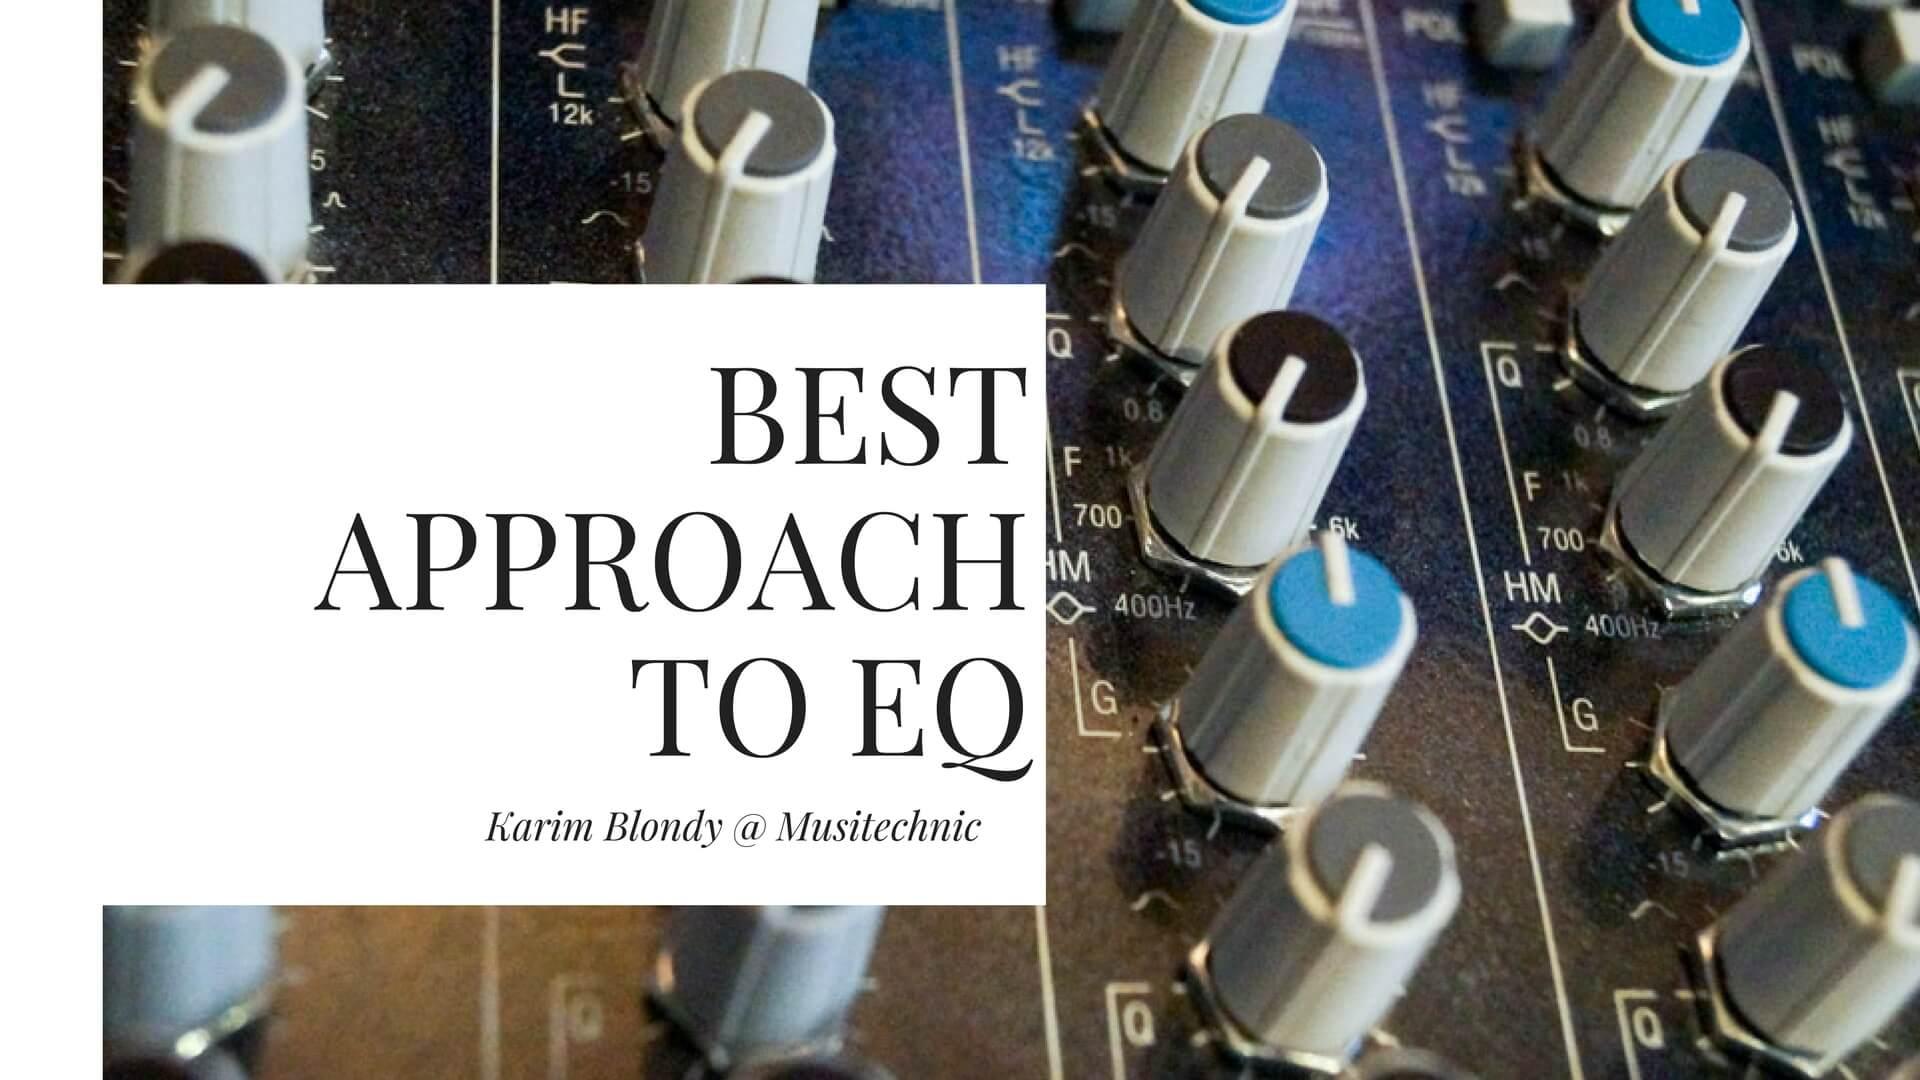 Best approach to EQ - Musitechnic blog